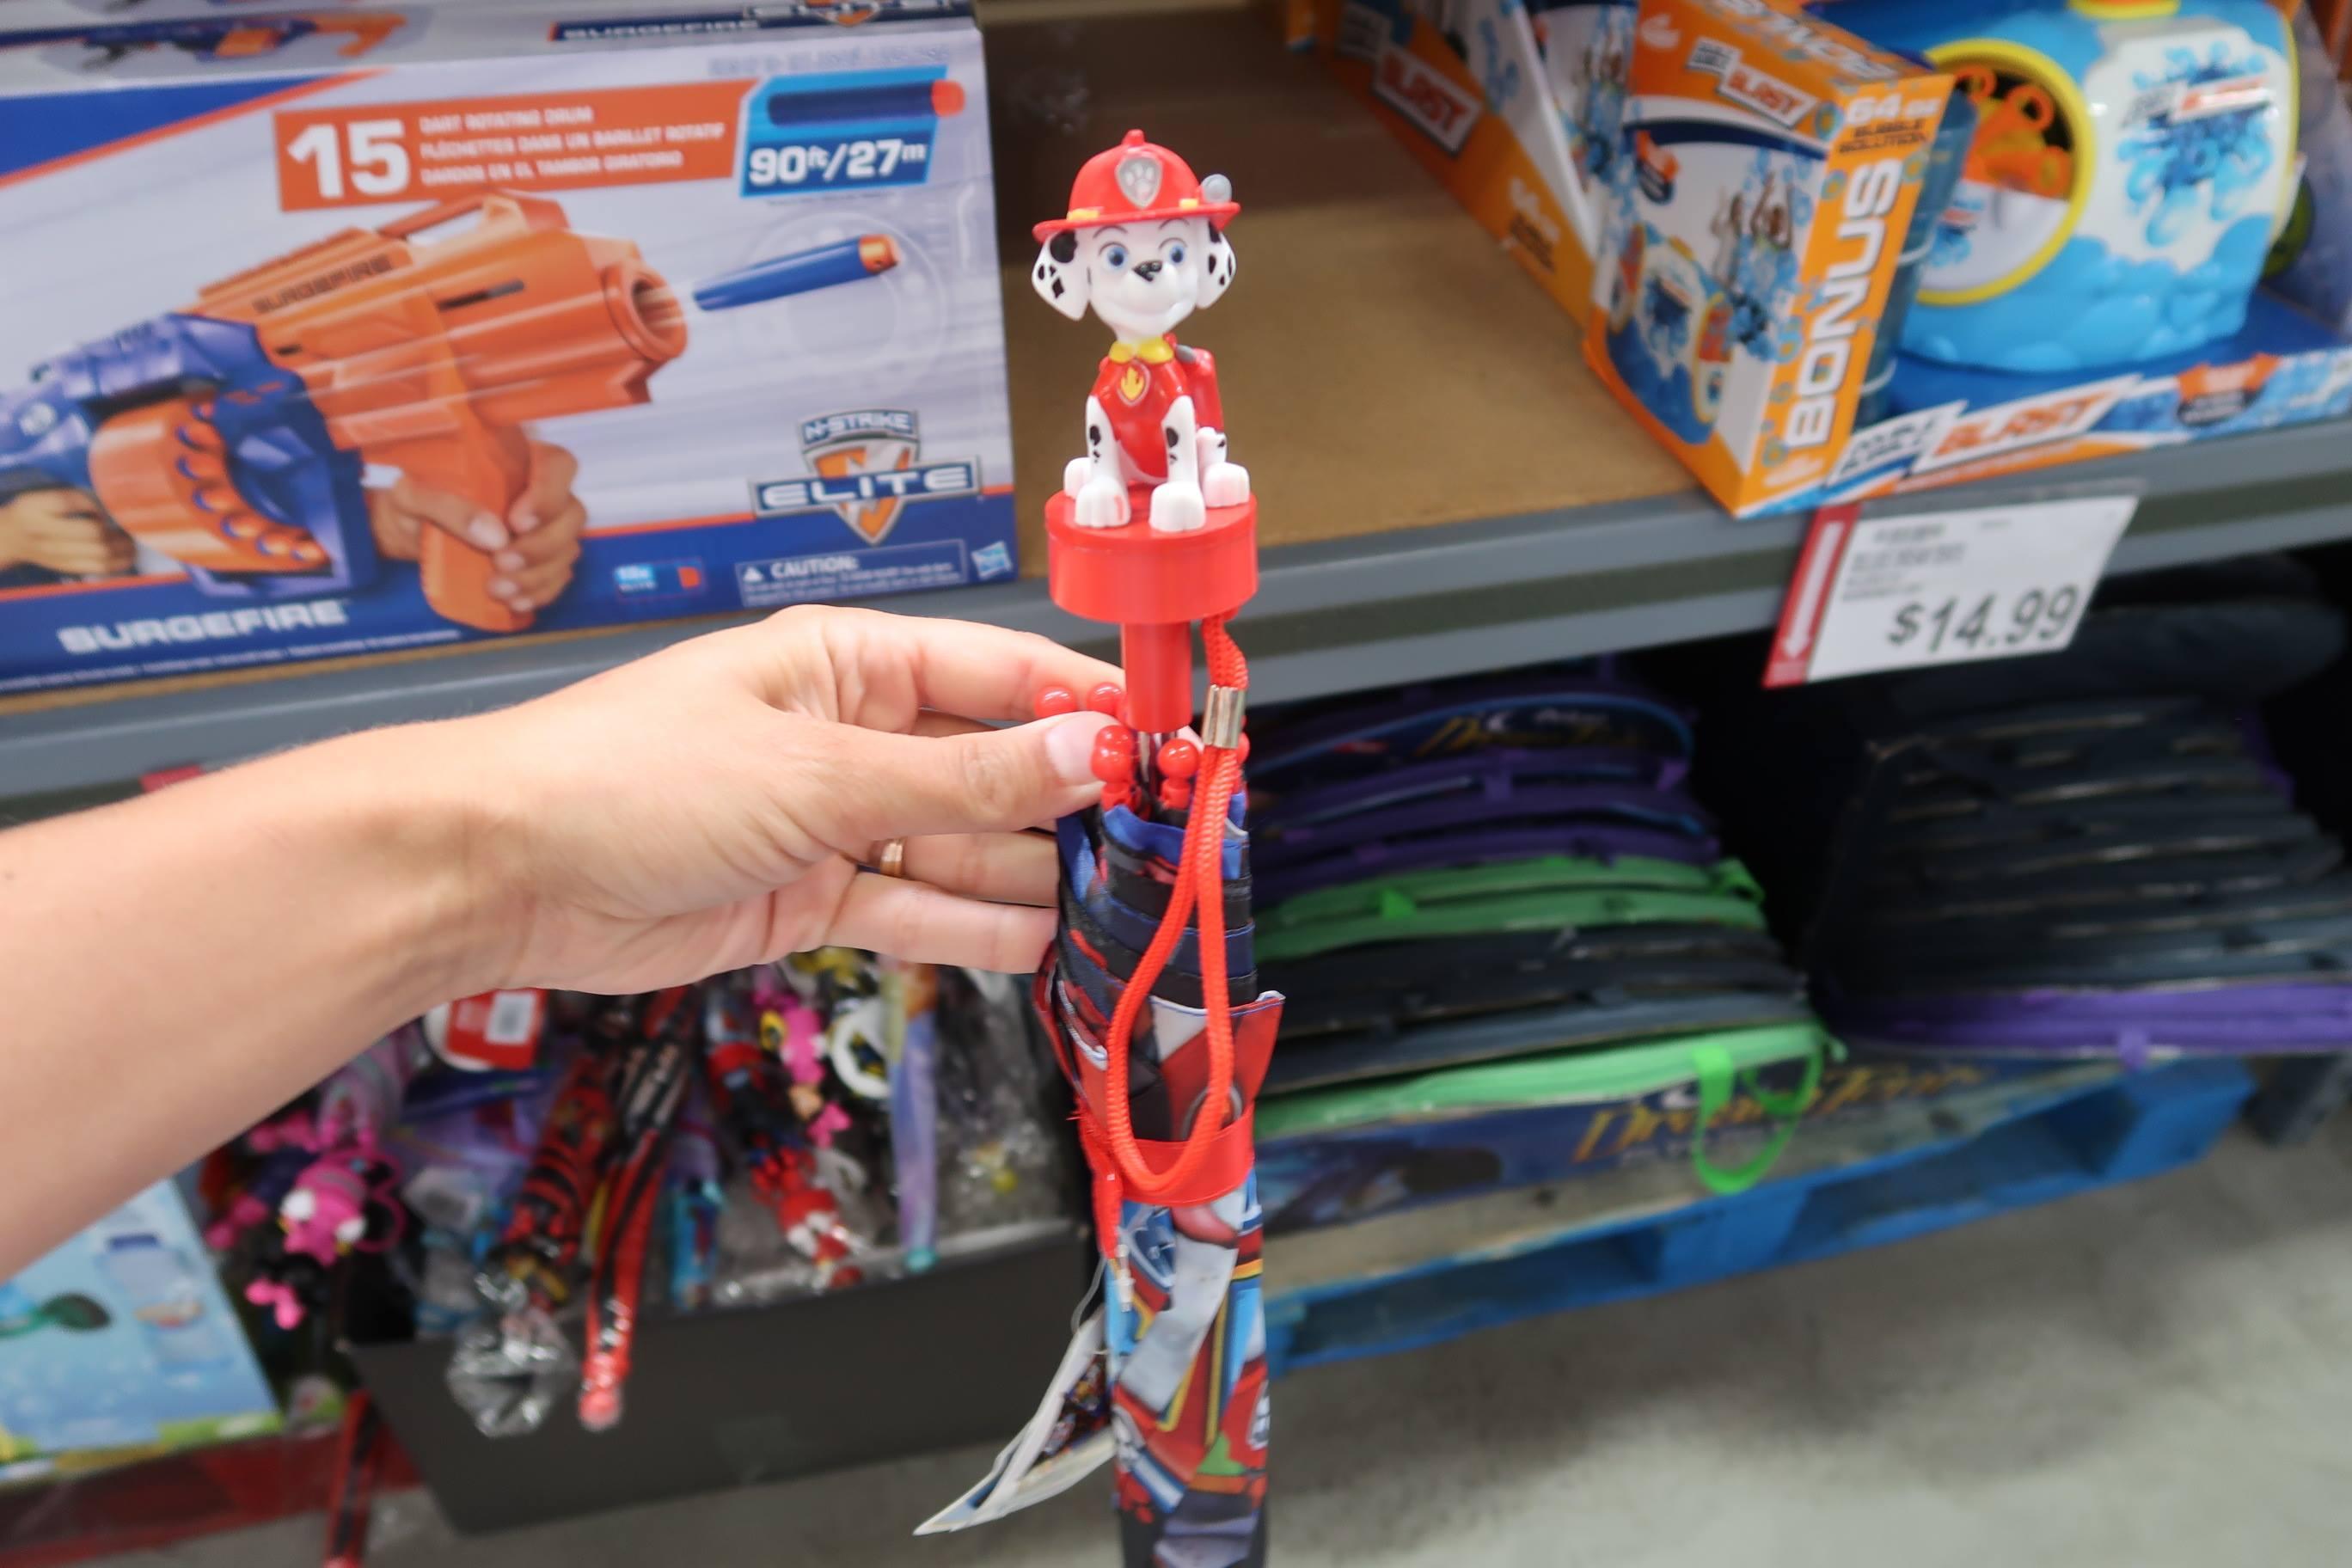 3D Hats & Kids Umbrellas Cheap at BJs